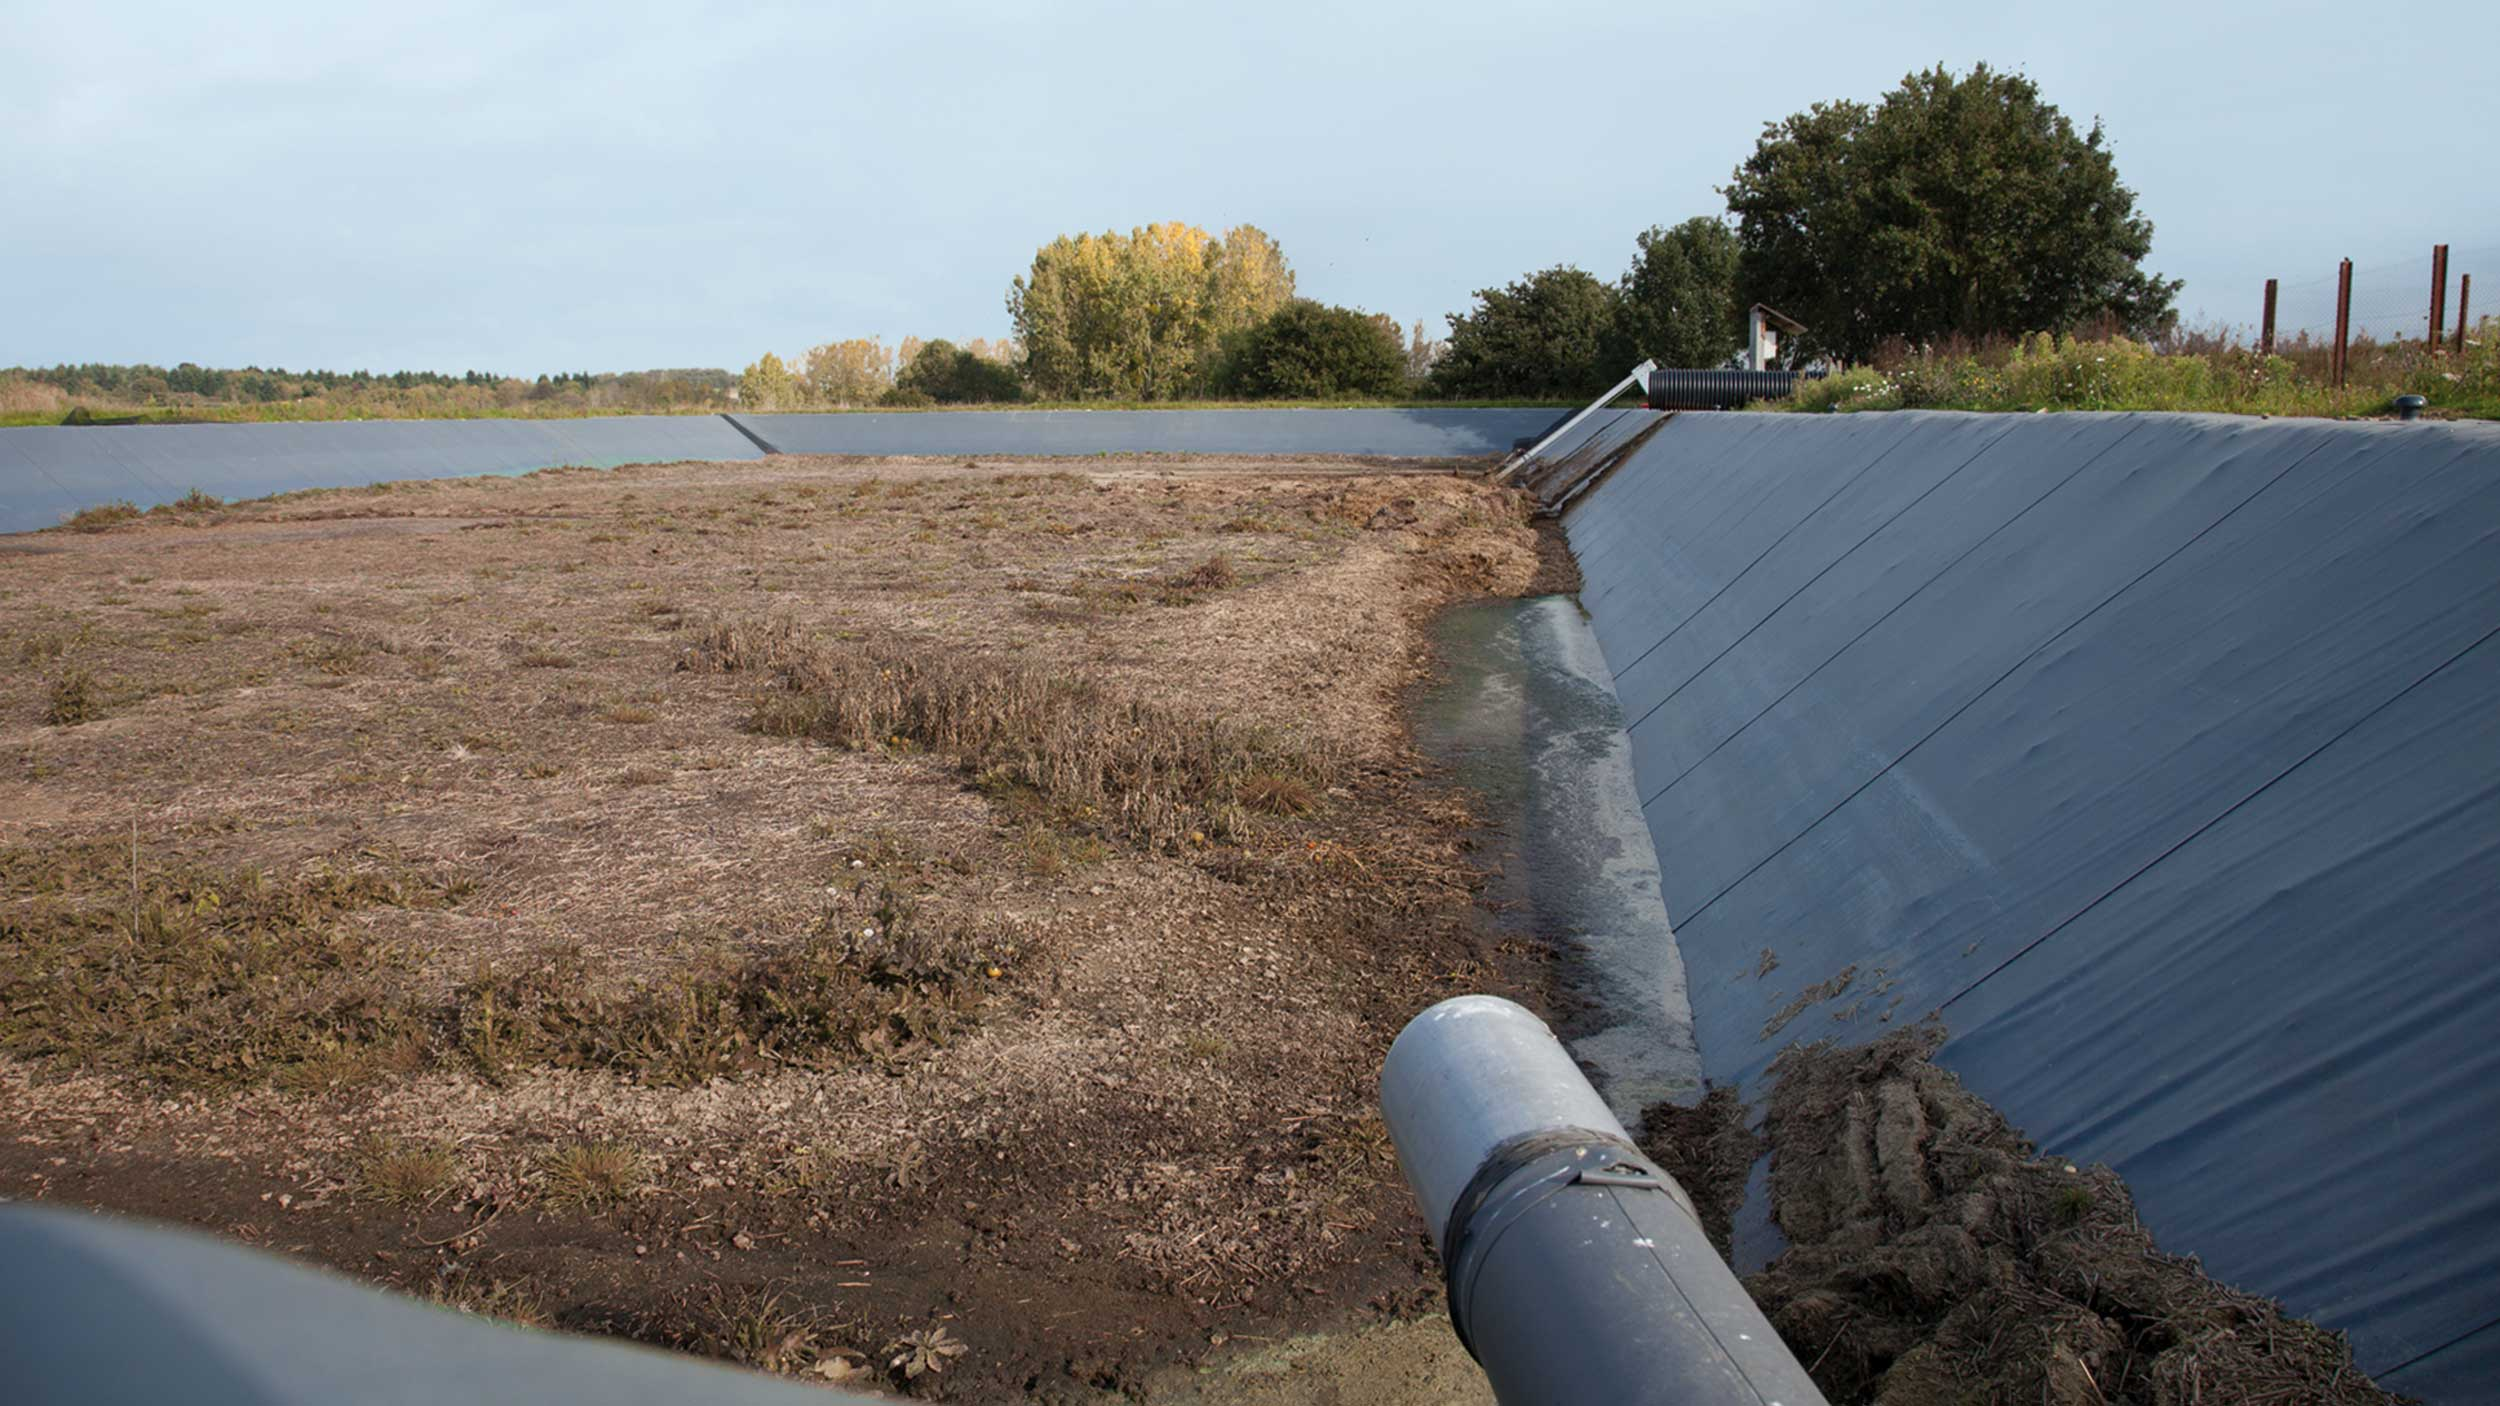 G omembrane pour fosses lisier bassins et lagunes for Bache geomembrane